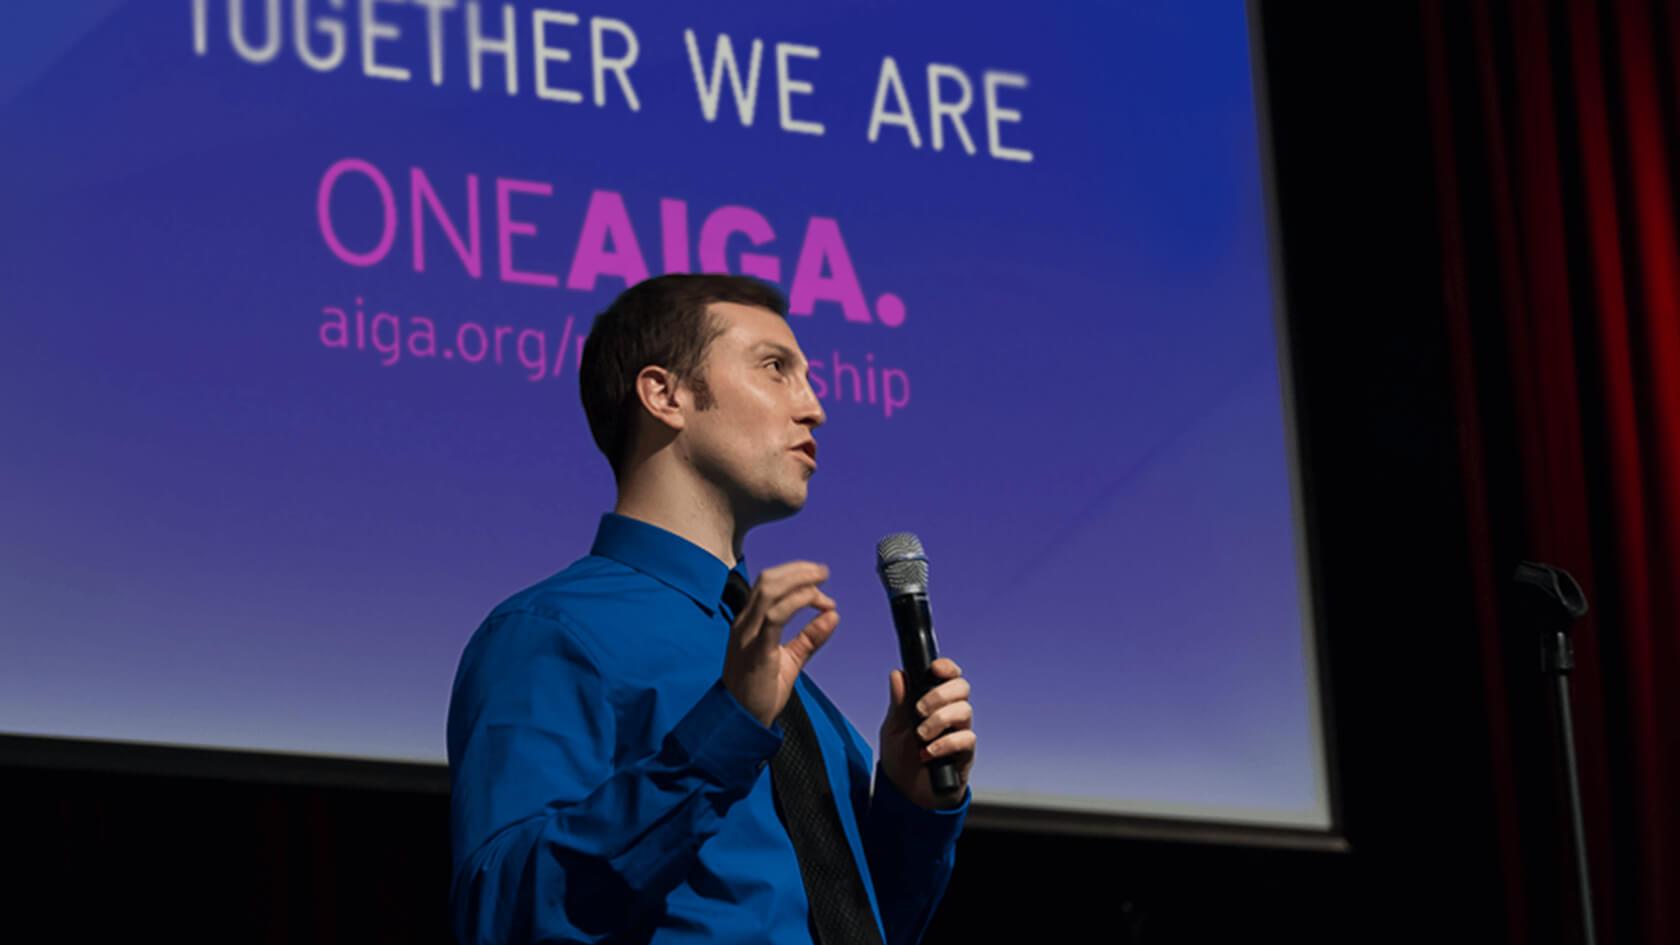 AIGA Boston President Matt Budelman delivering speech